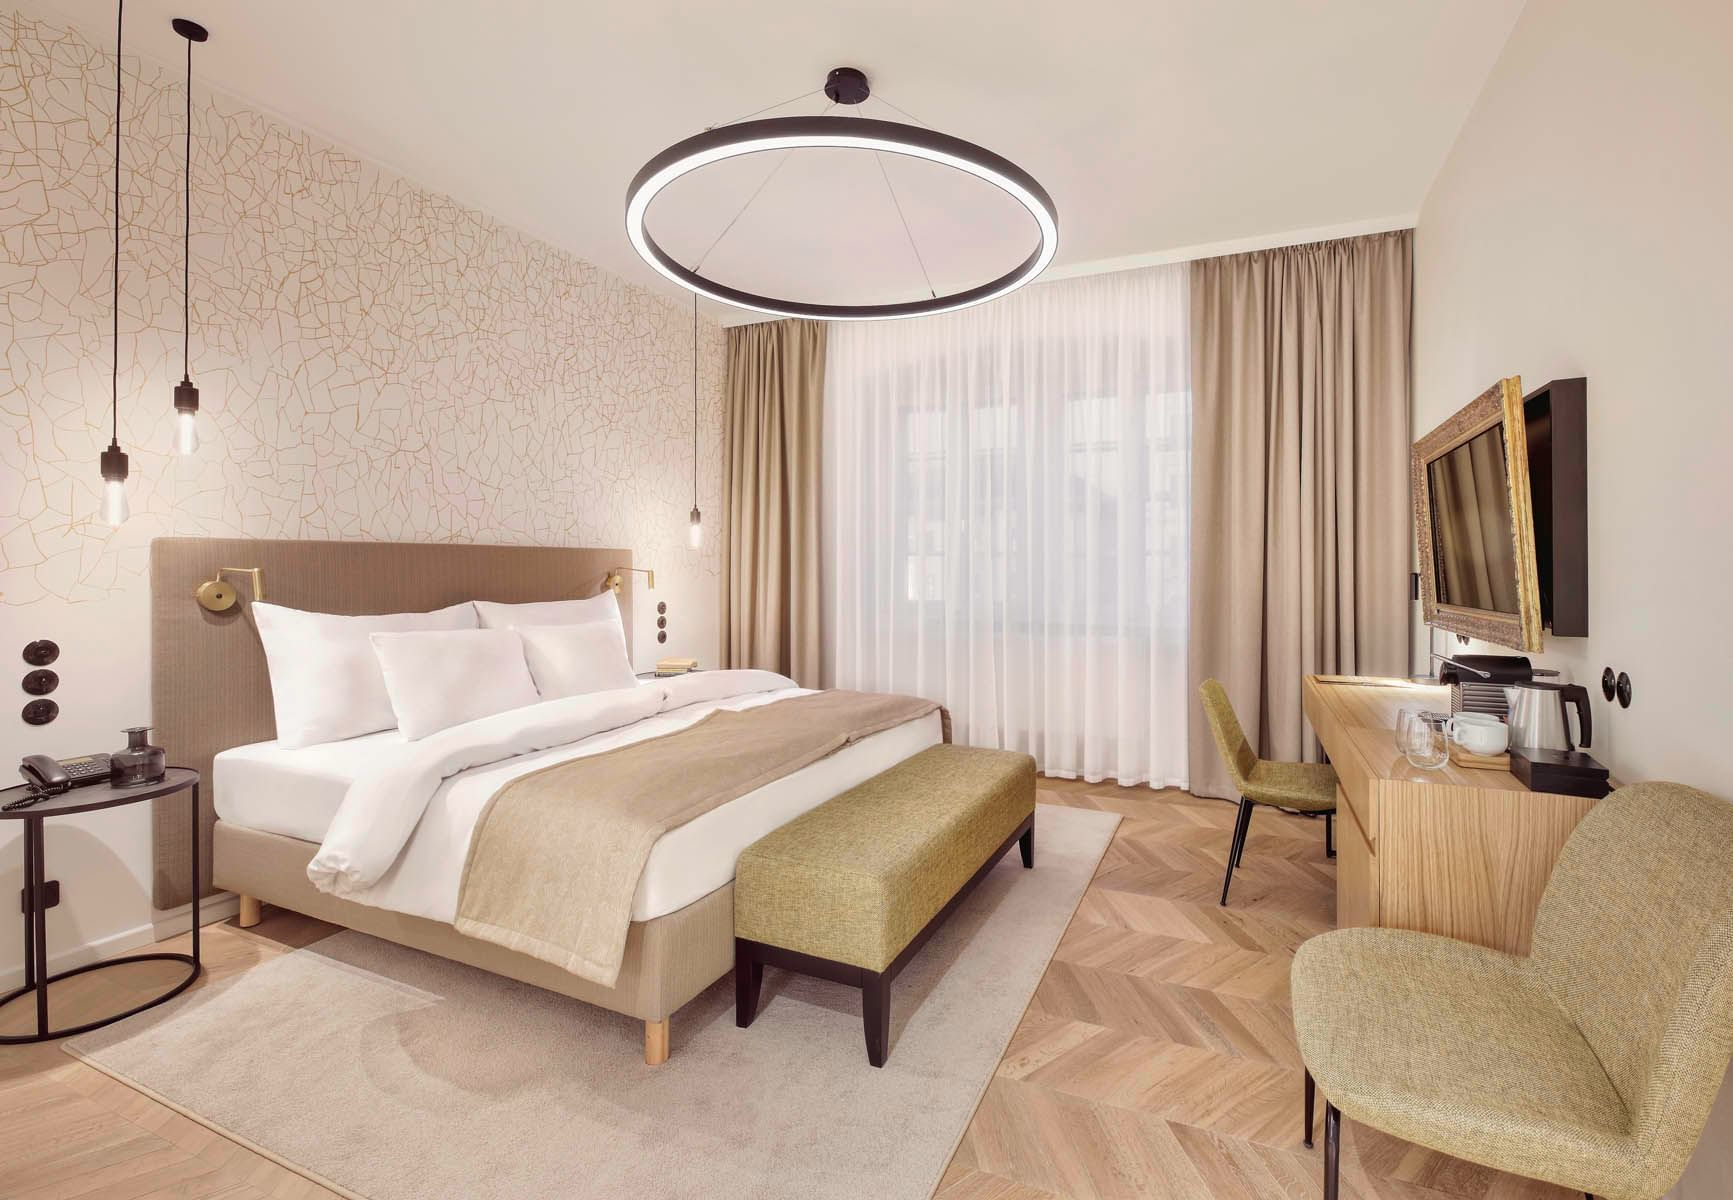 Superior Room at Hotel Old Inn